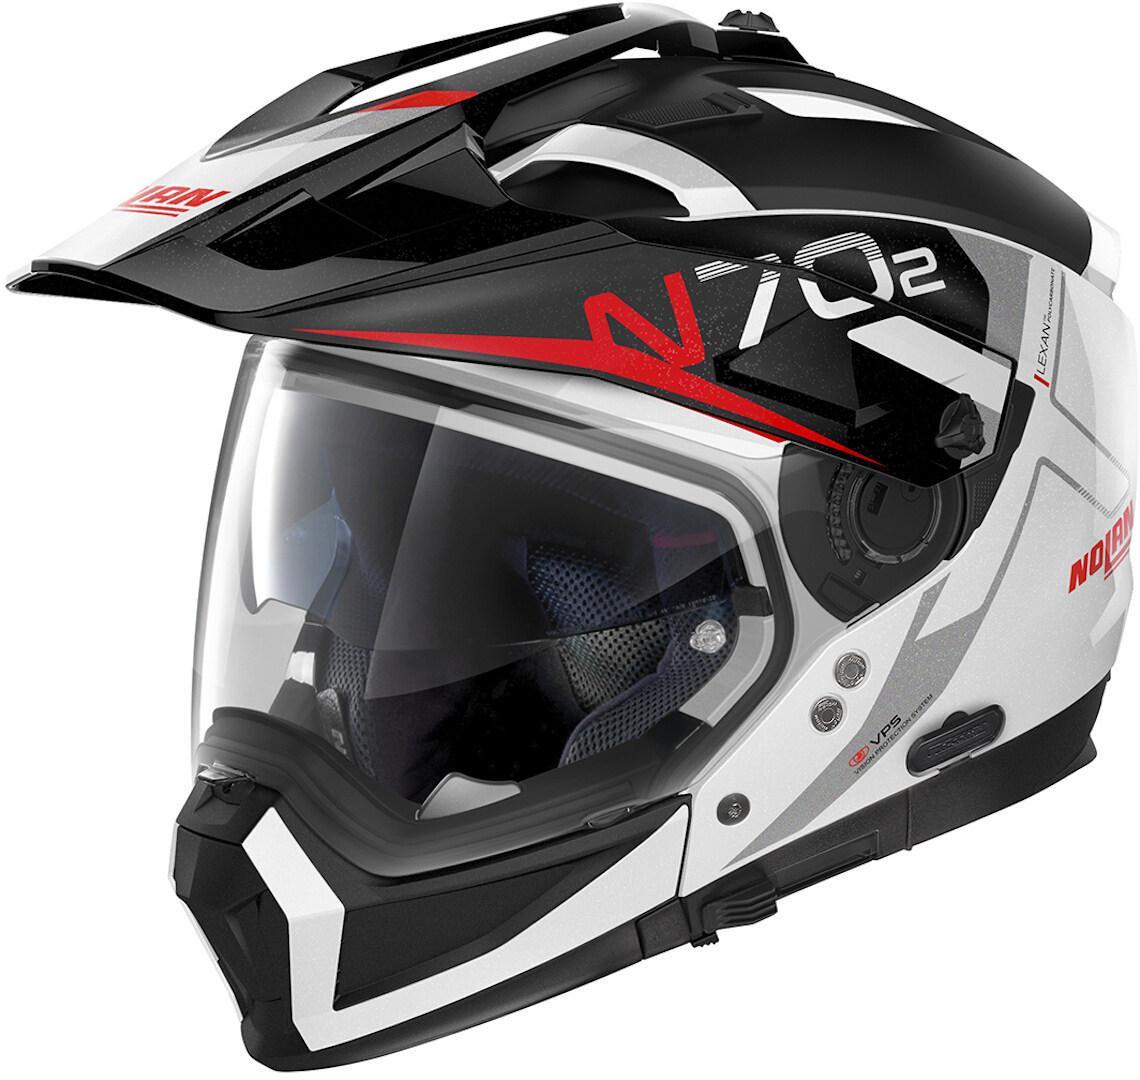 Nolan N70-2 X Bungee N-Com Helm, schwarz-weiss, Größe XL, schwarz-weiss, Größe XL